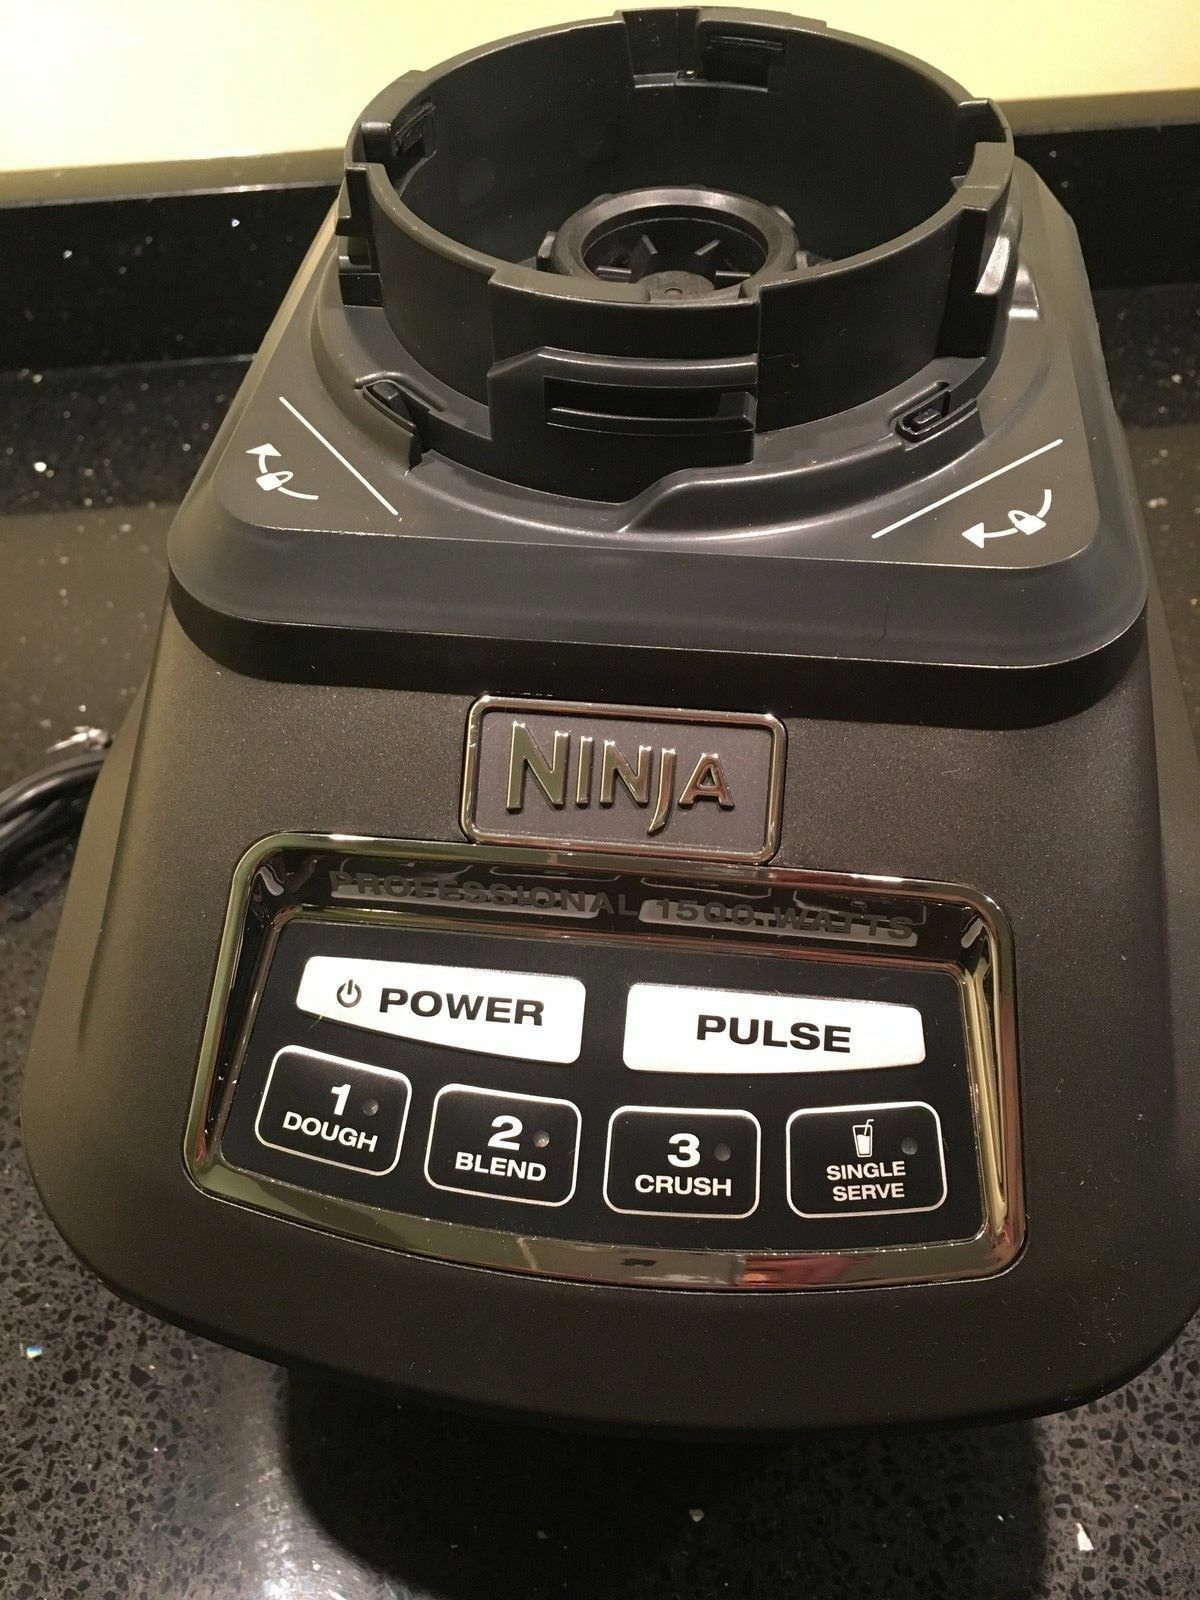 NEW Ninja Blender Power Motor Base 1500 Watts Replacement  BL770 BL771 BL773